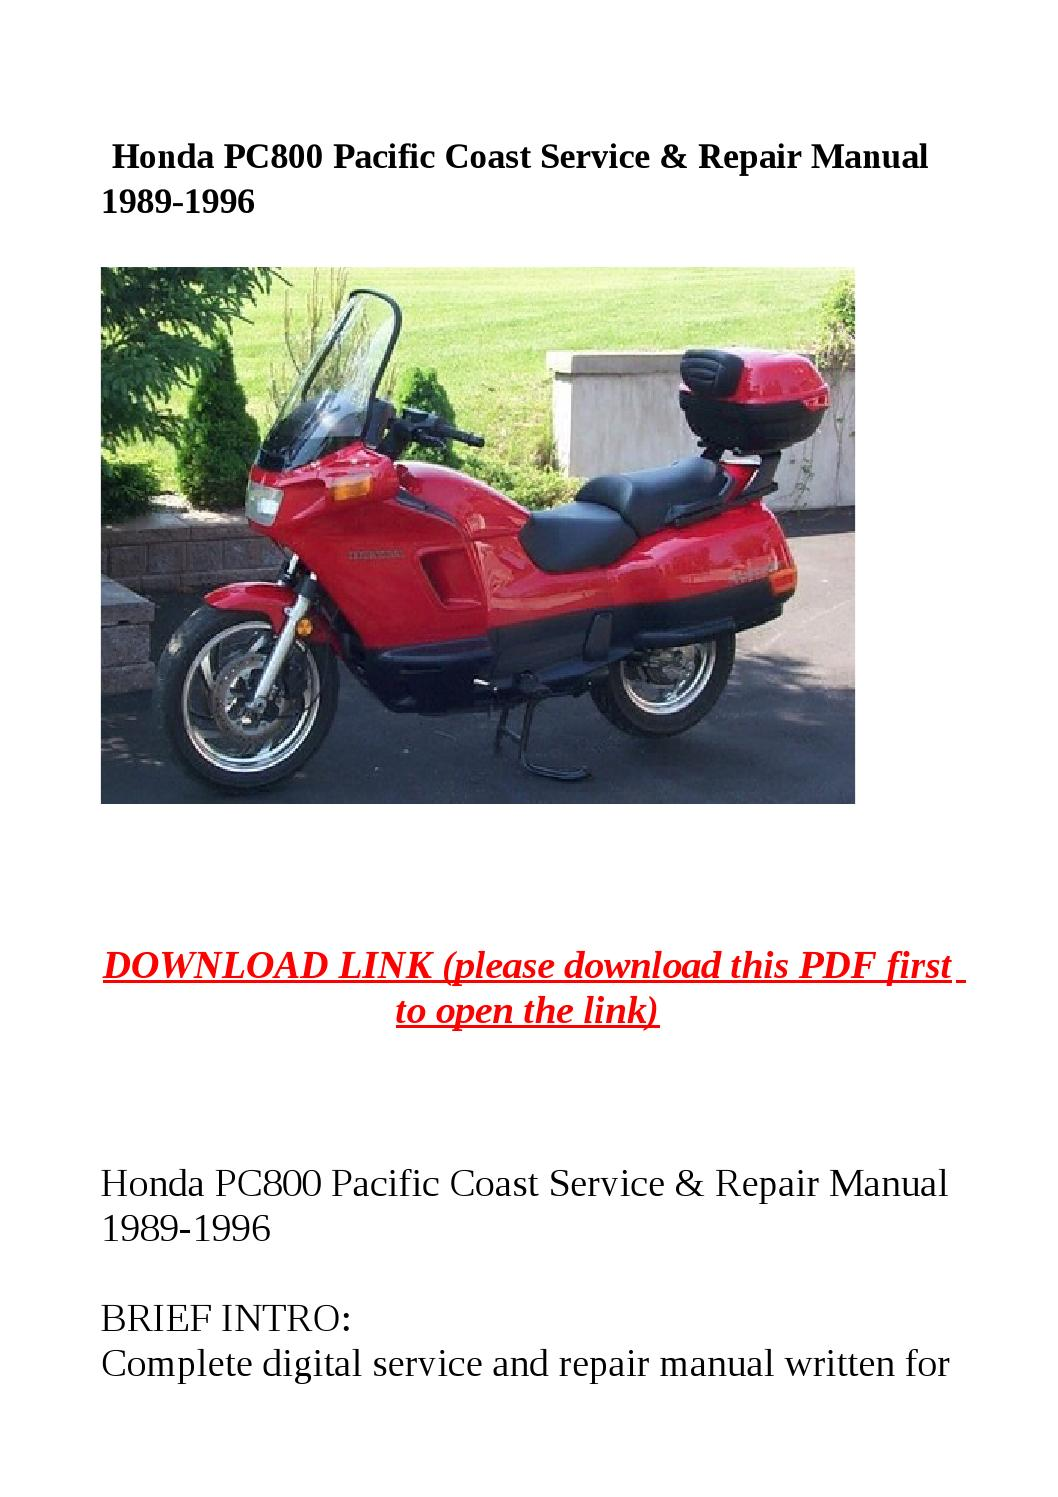 Honda pc800 pacific coast service & repair manual 1989 1996 by Sally Mool -  issuu